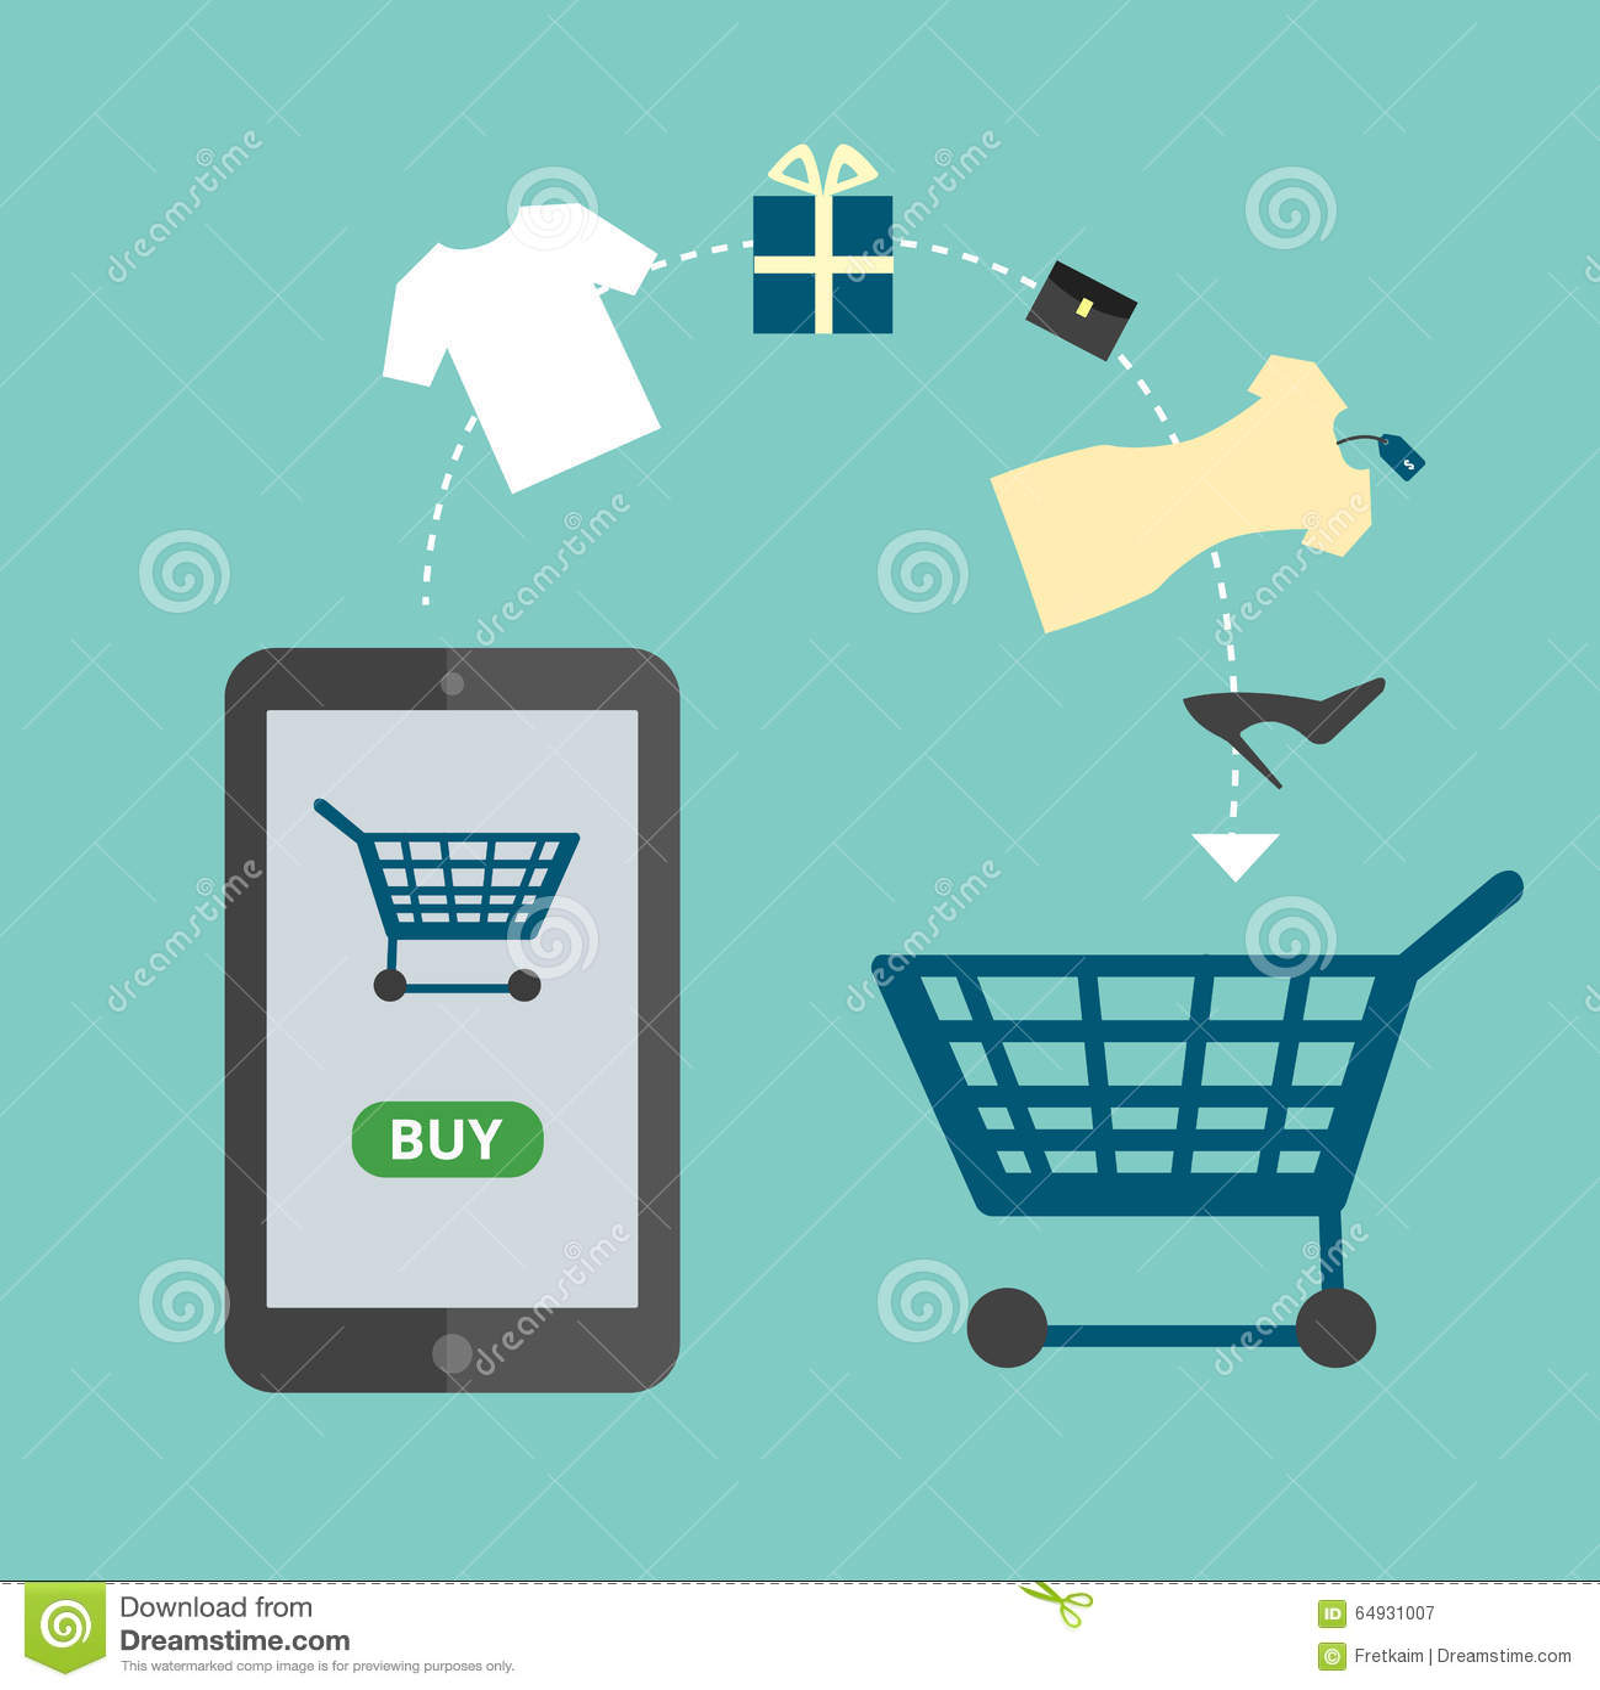 Mobile phone as online store online shopping vector for Design scandinavo shop online